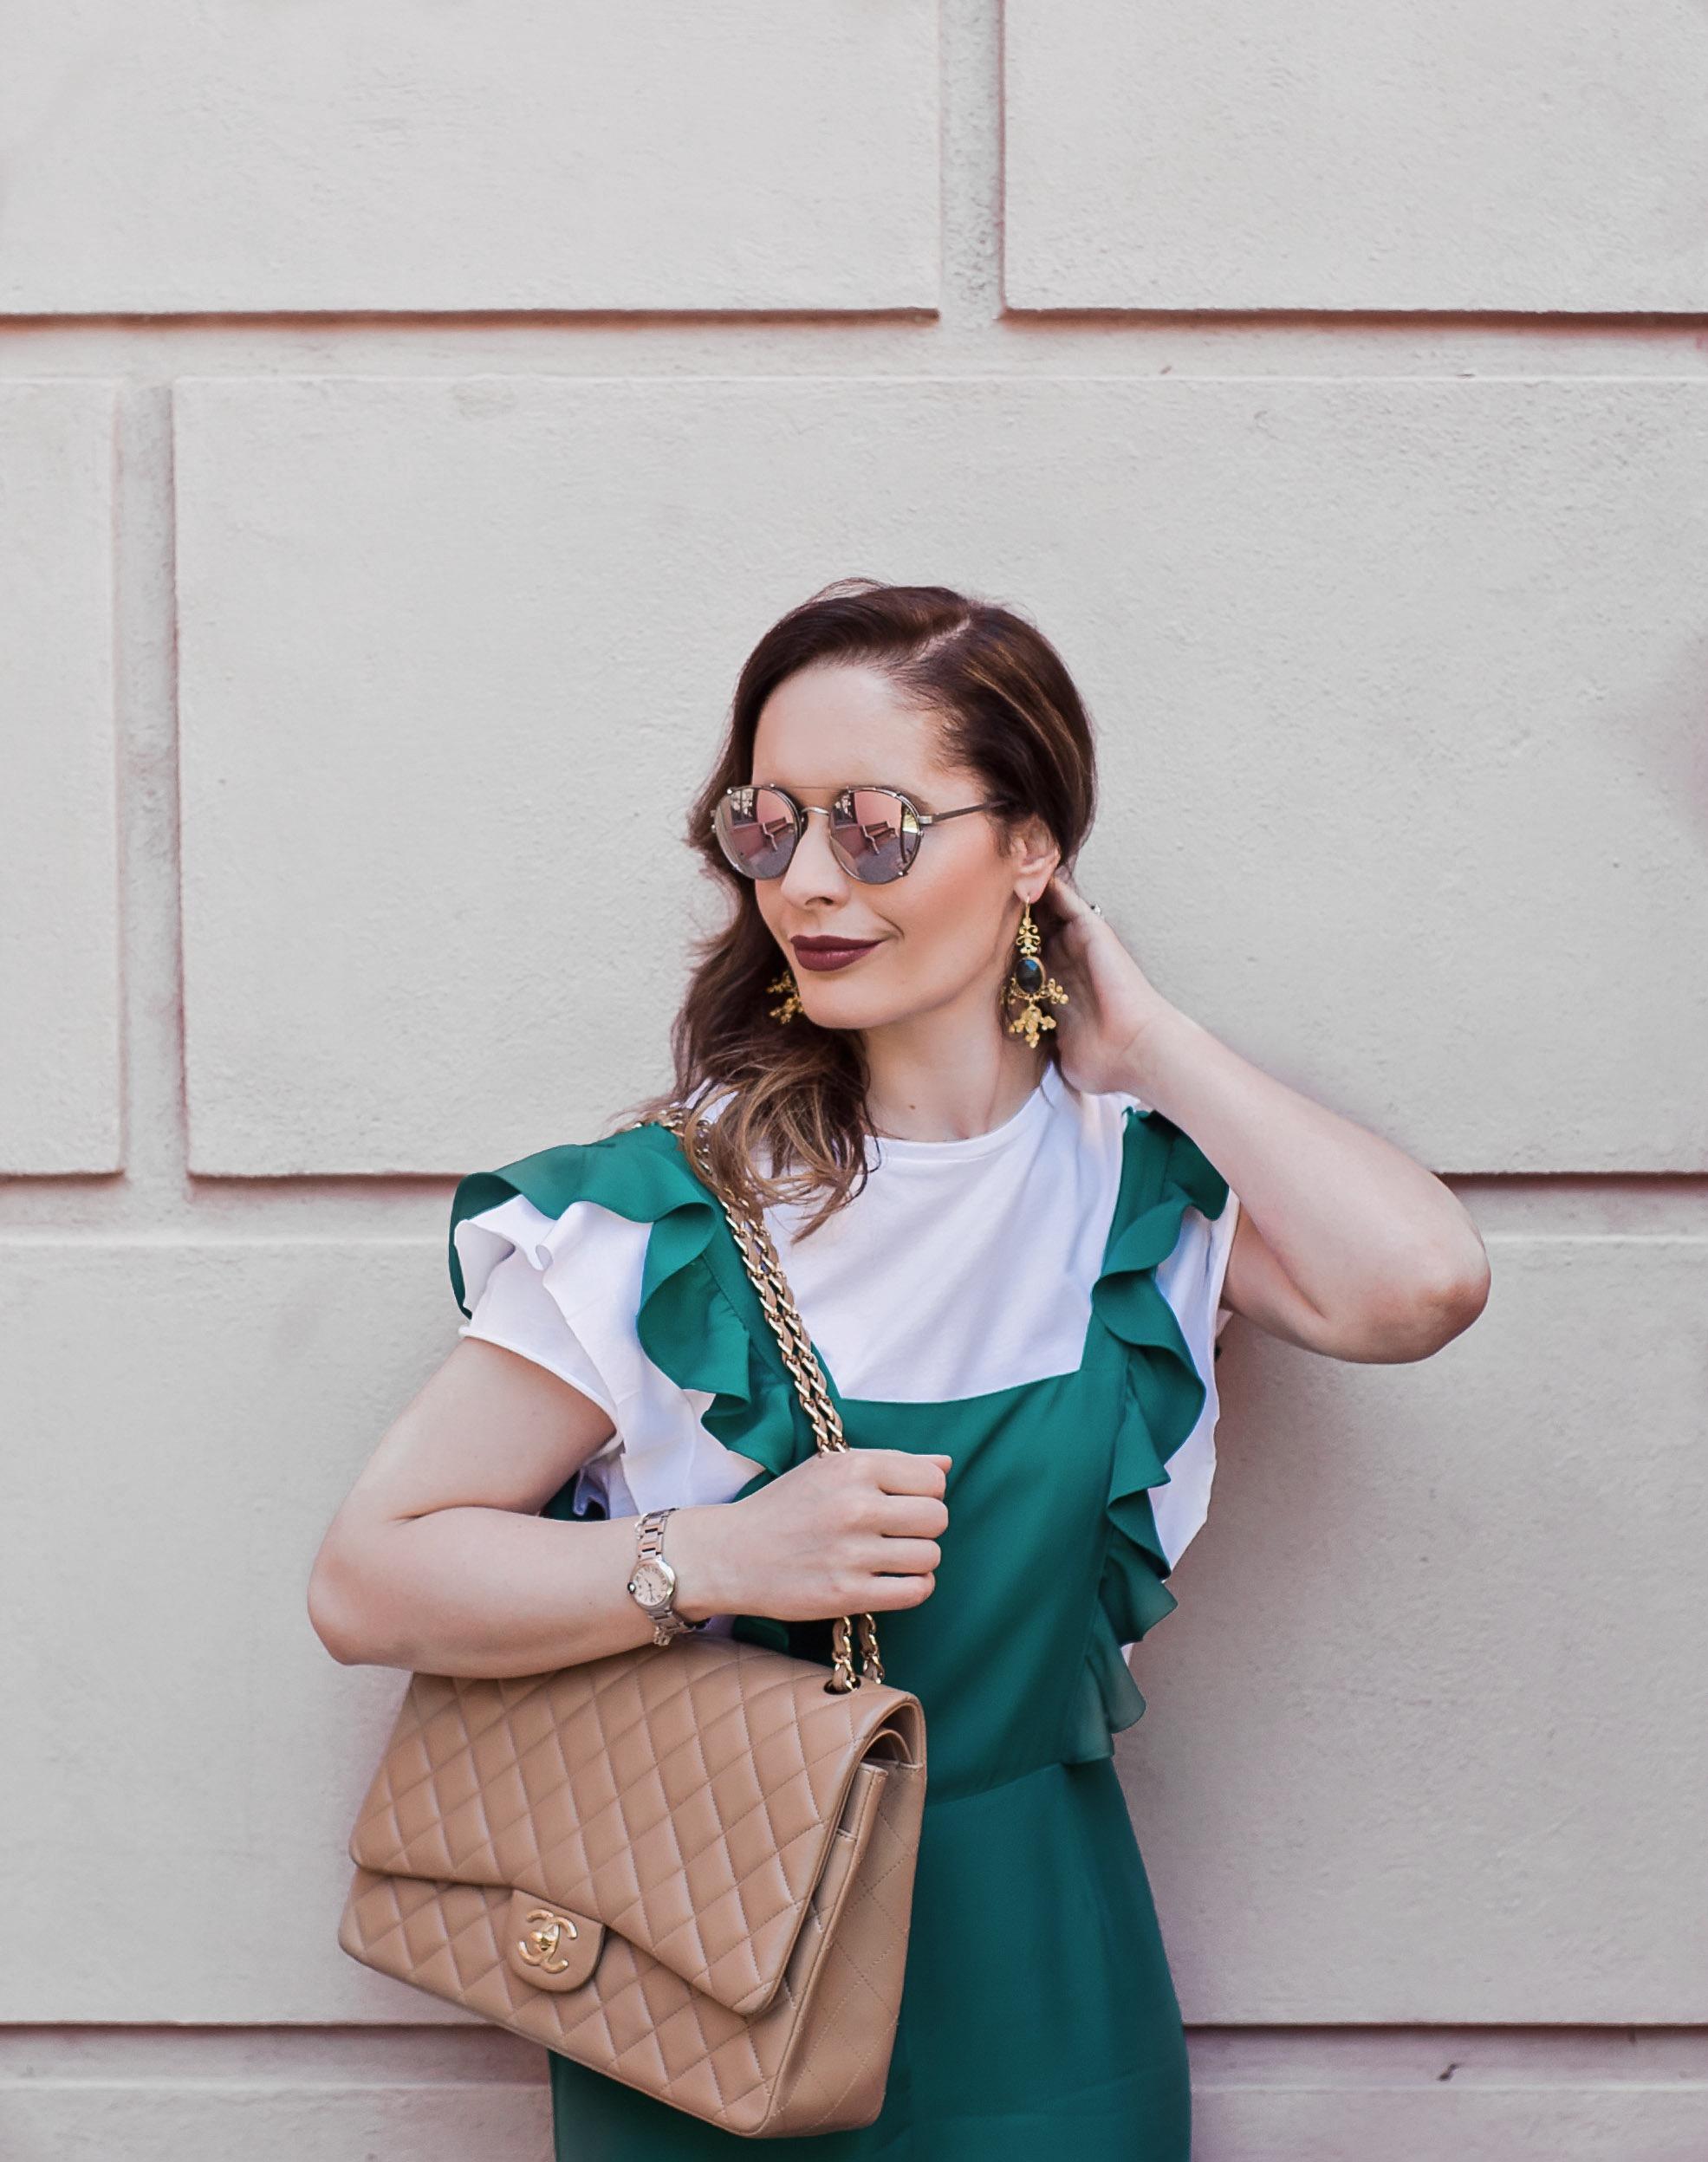 Ottoman Hands Earrings Bag Vibes blog